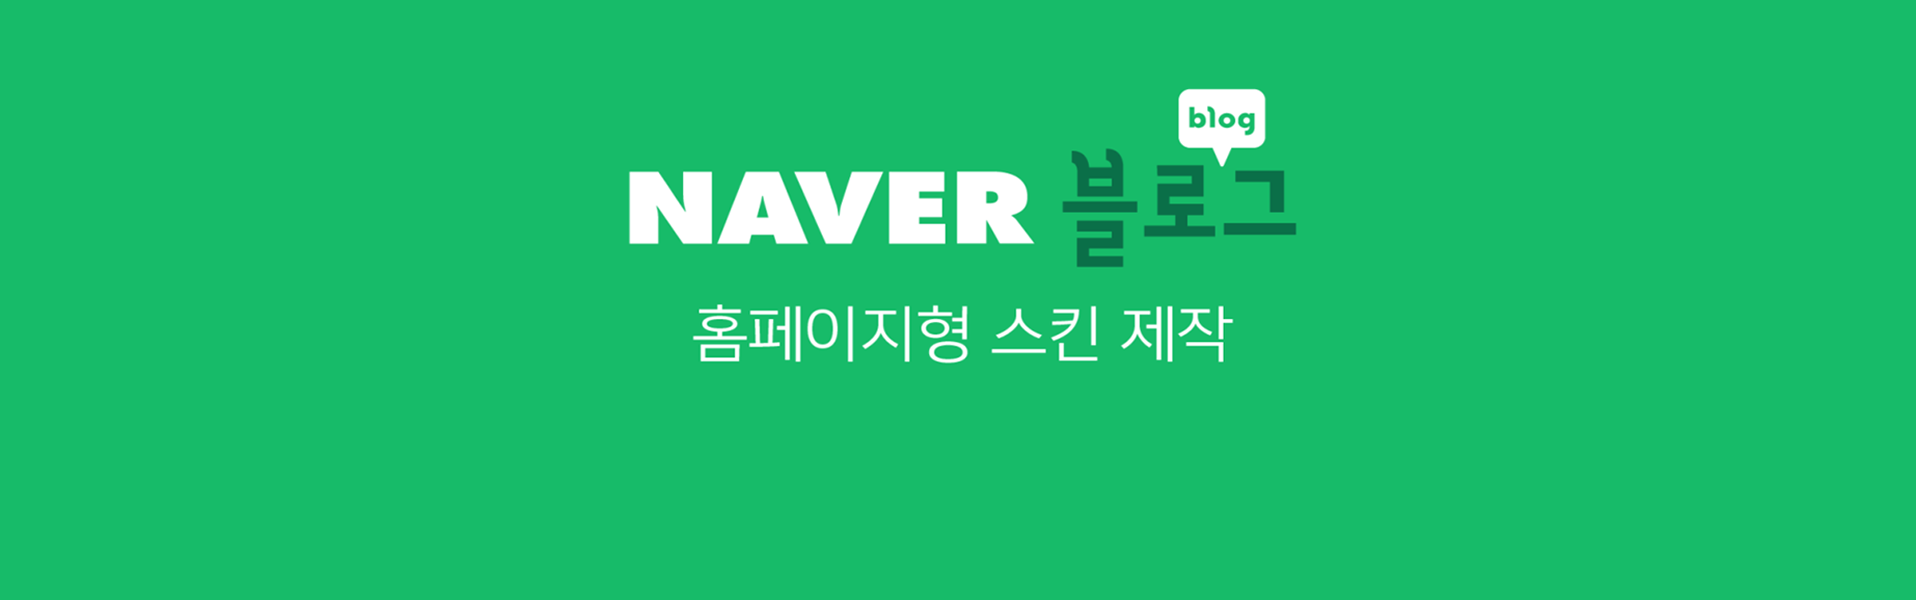 Blog naver